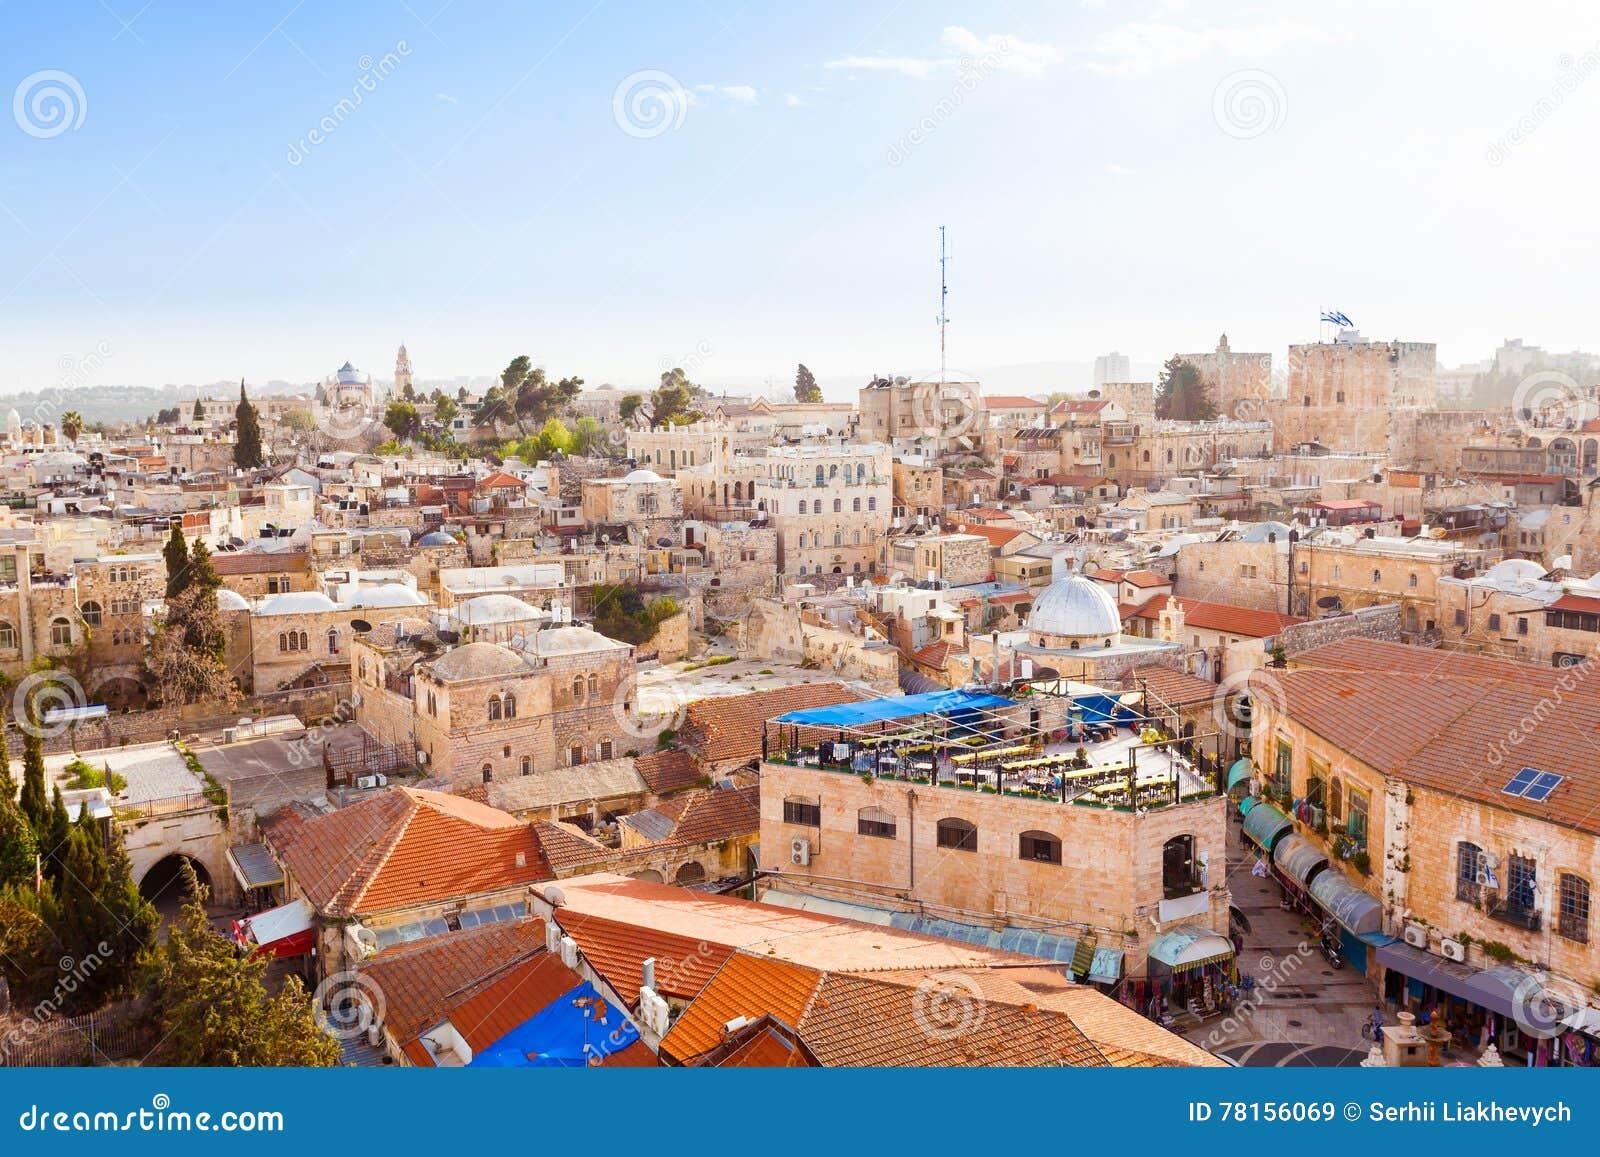 Old City Jerusalem From Above Dormition Abbey Stock